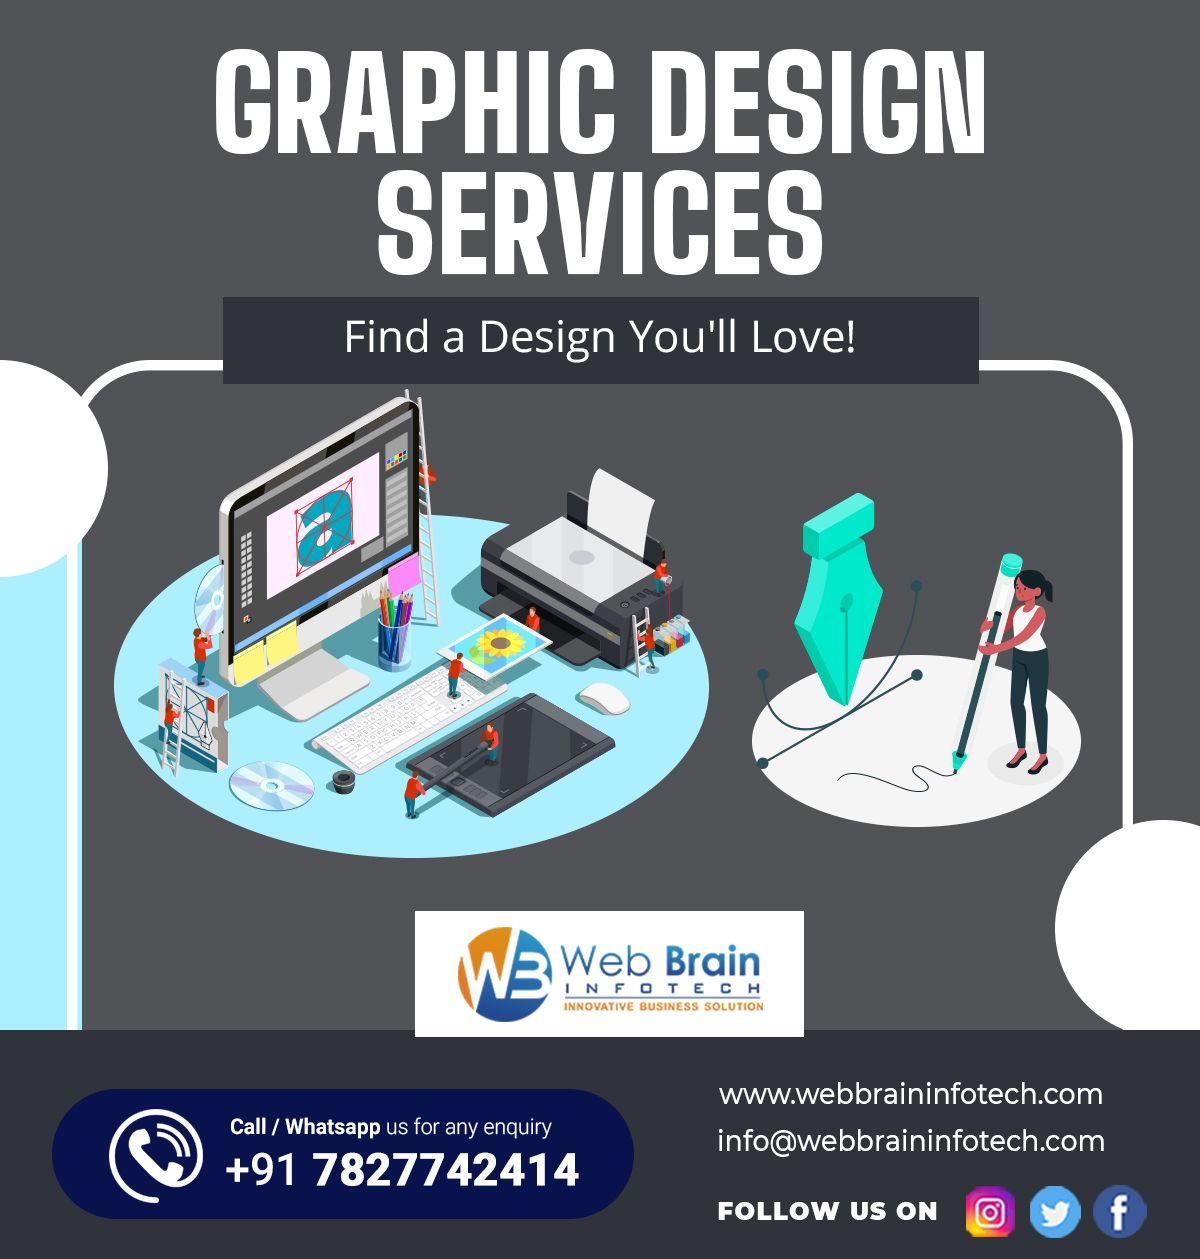 Graphic Design Services Agency In India Graphic Design Services Graphic Design Company Professional Graphic Design